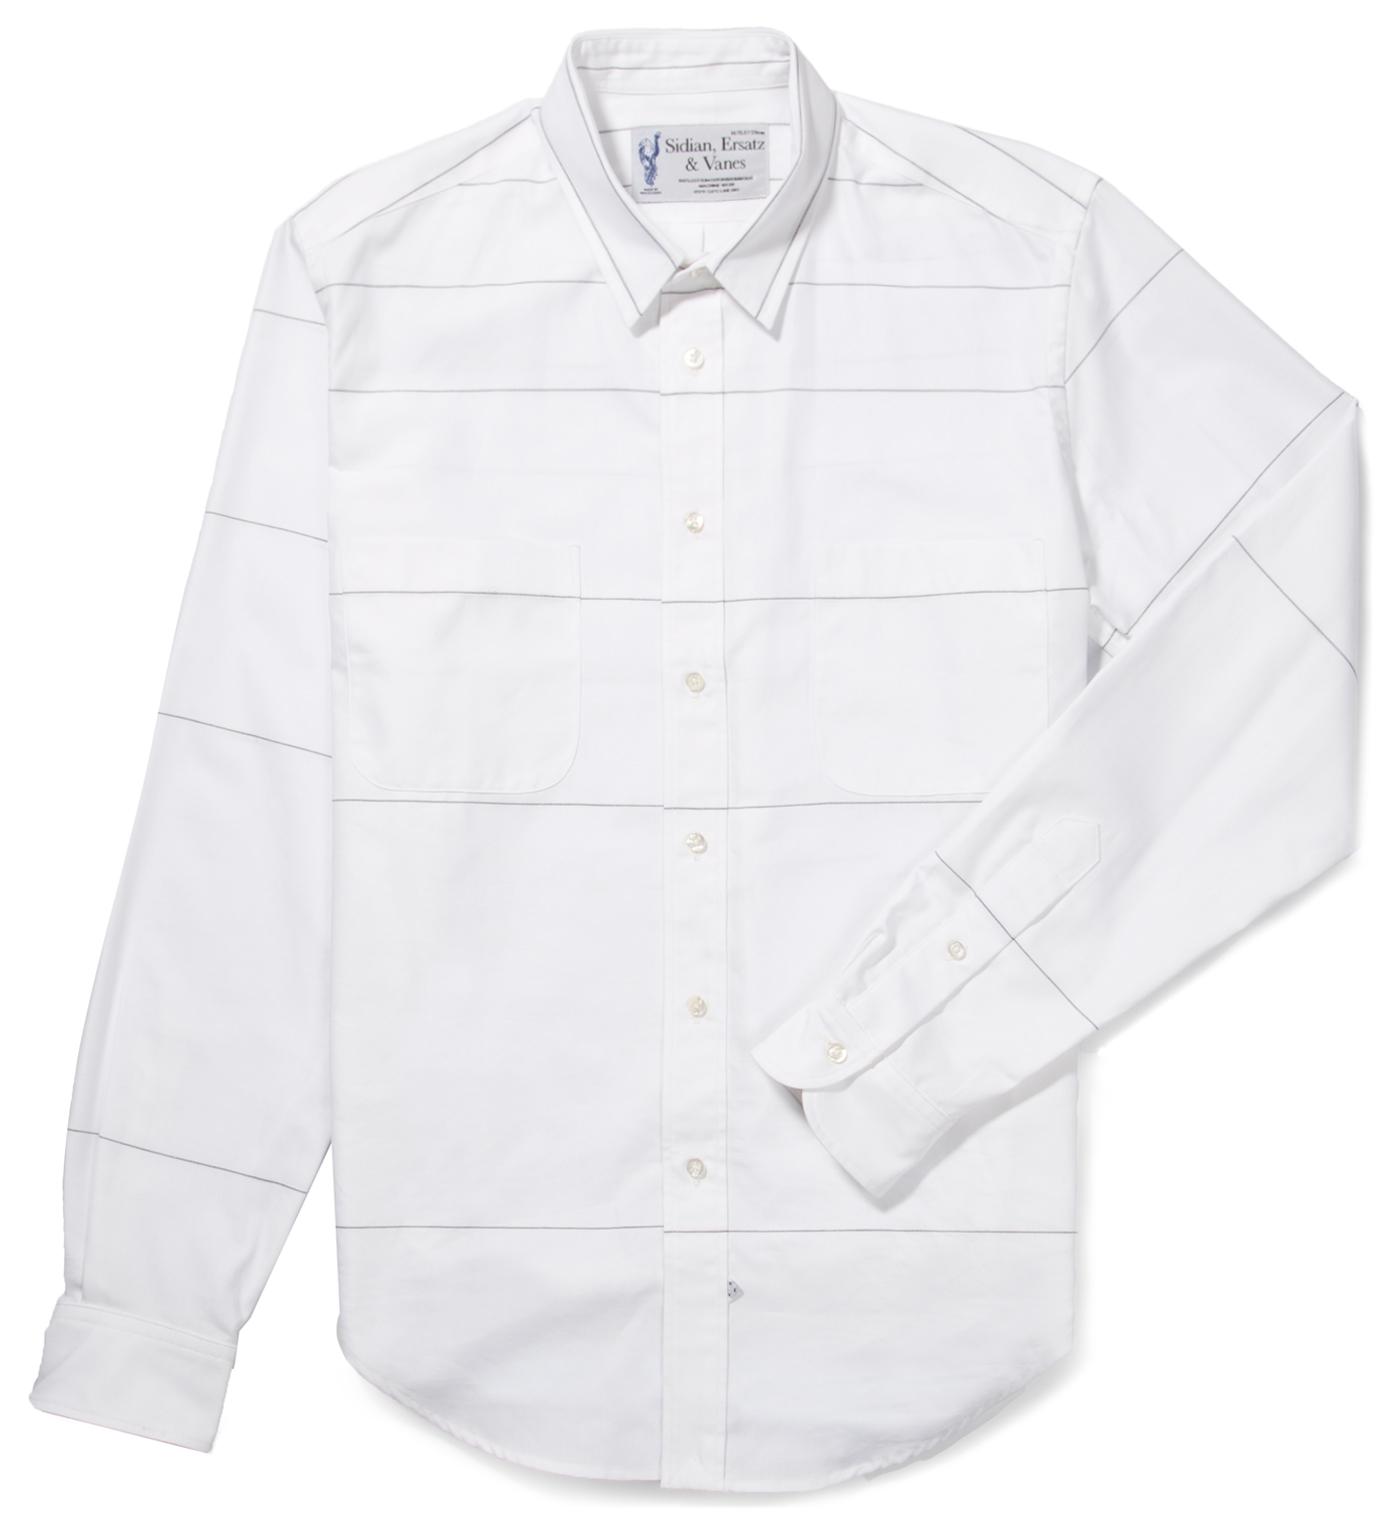 Sidian, Ersatz & Vanes Grey/Black Lines Shirt